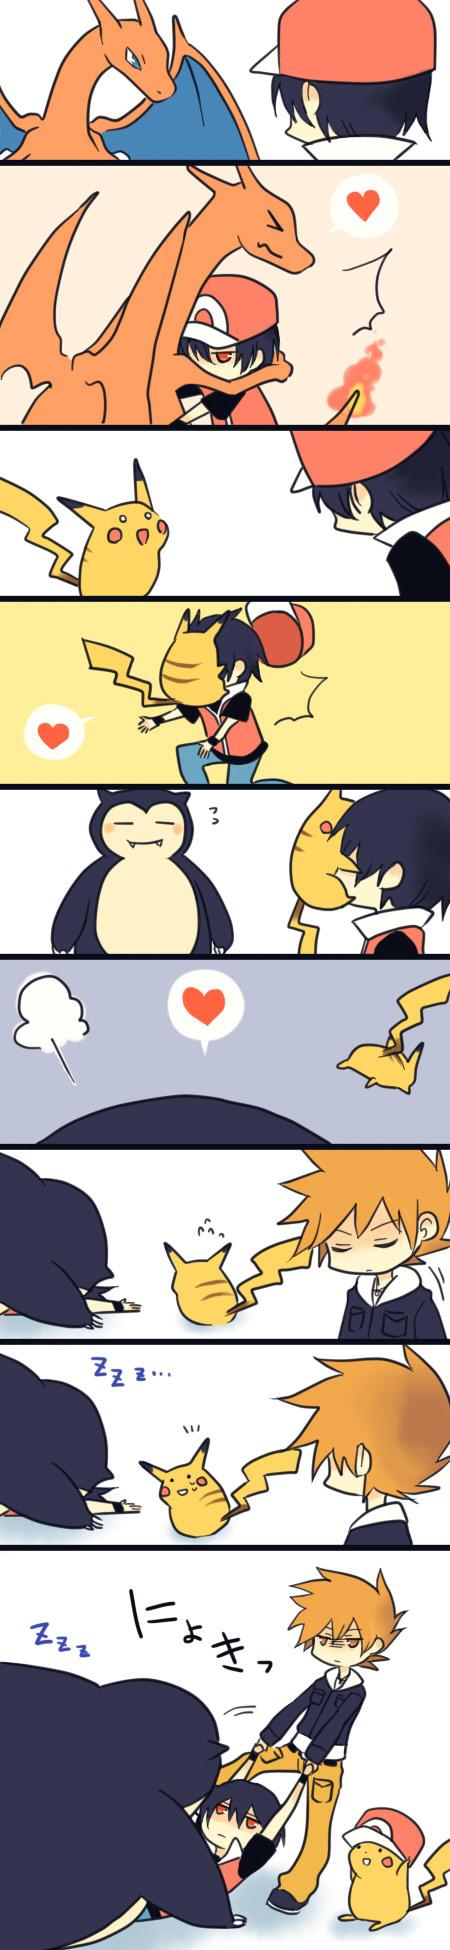 Carinho pode machucar swim cute pokemon and ash